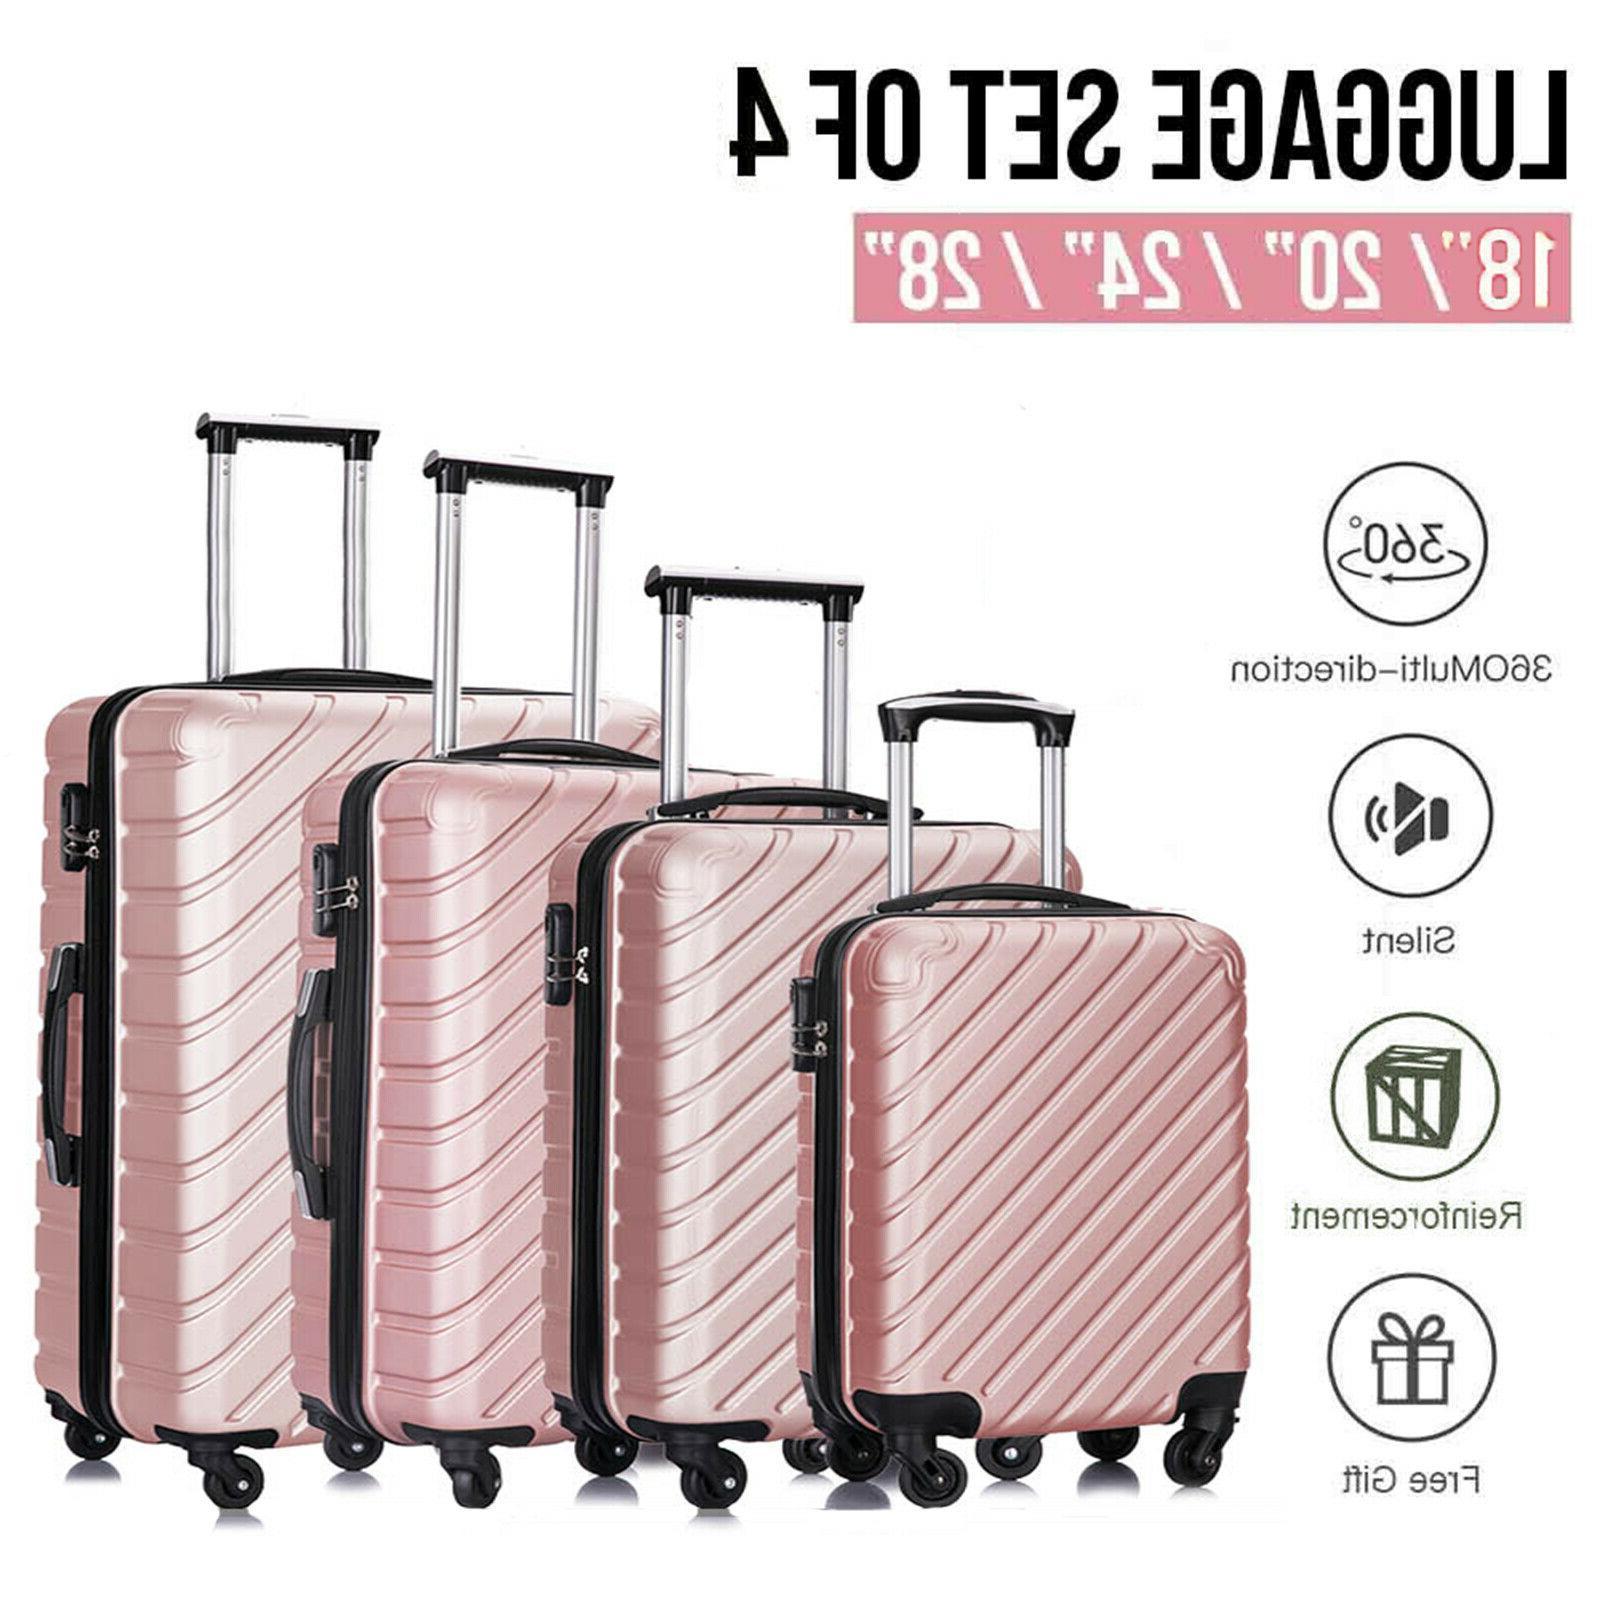 3/4 piece Luggage Set Hardcase ABS Spinner